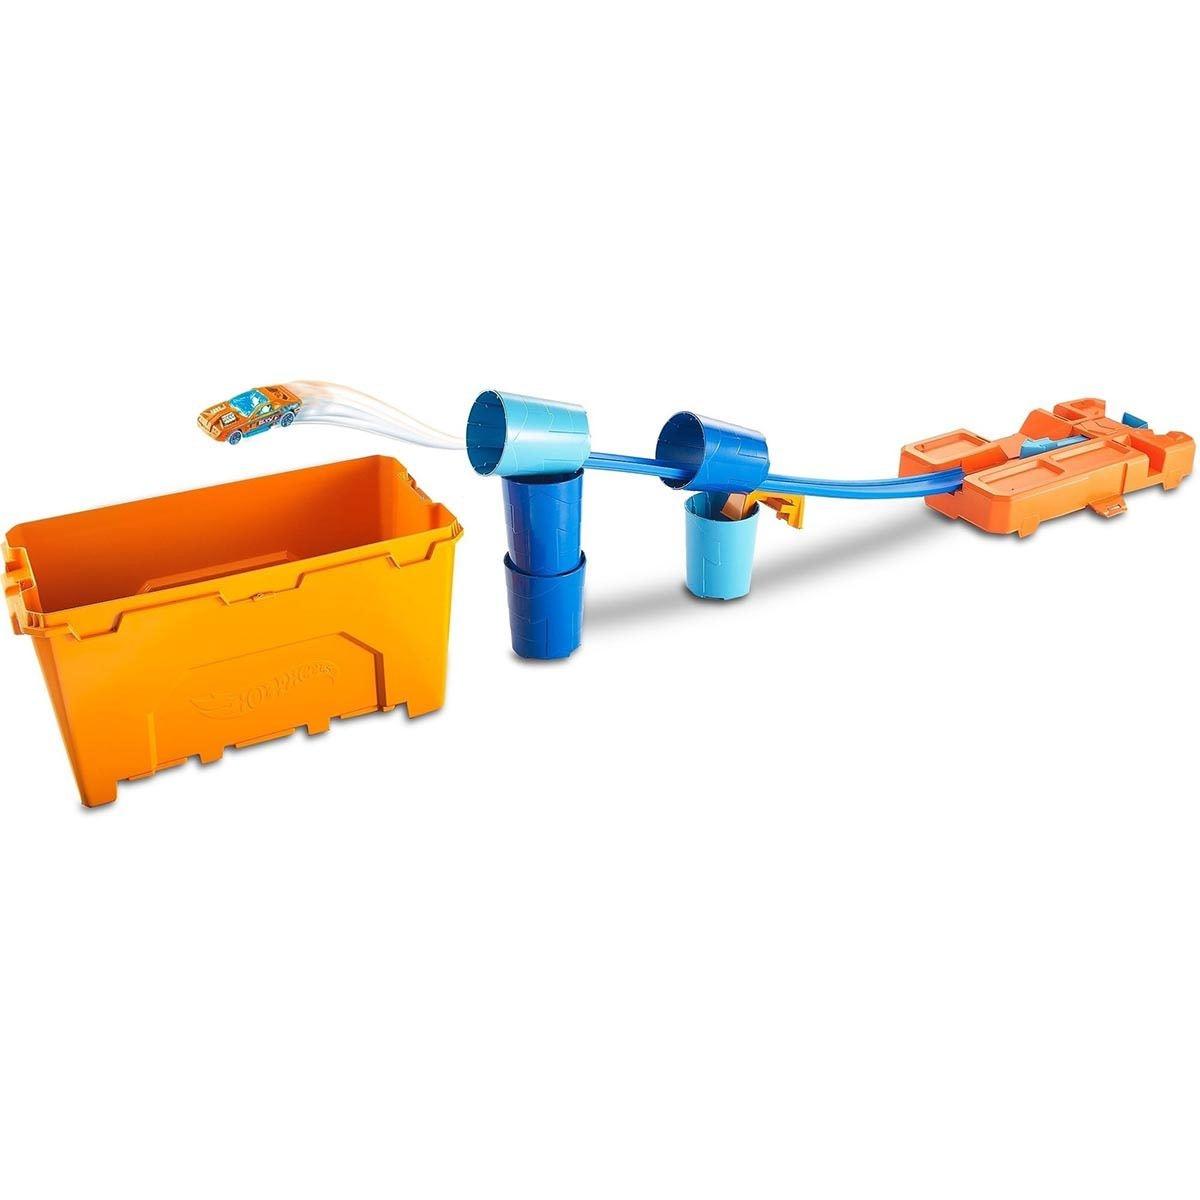 Hot Wheels Track Builder, Caja de Acrobacias